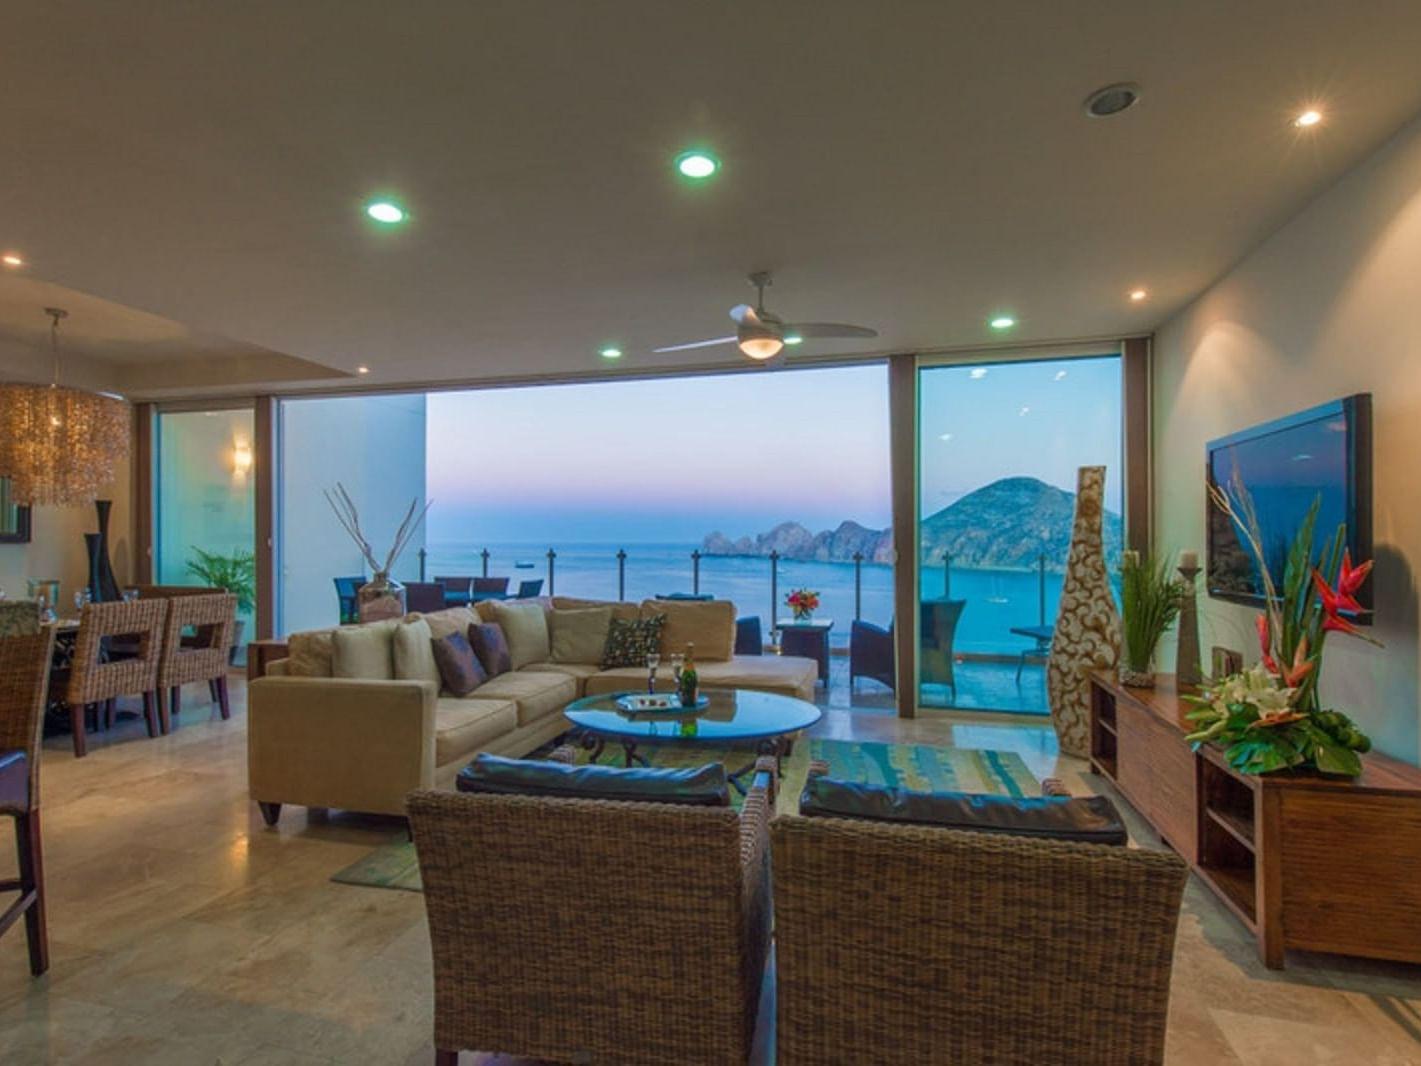 Penthouse Ocean View living room at Cabo Villas Beach Resort